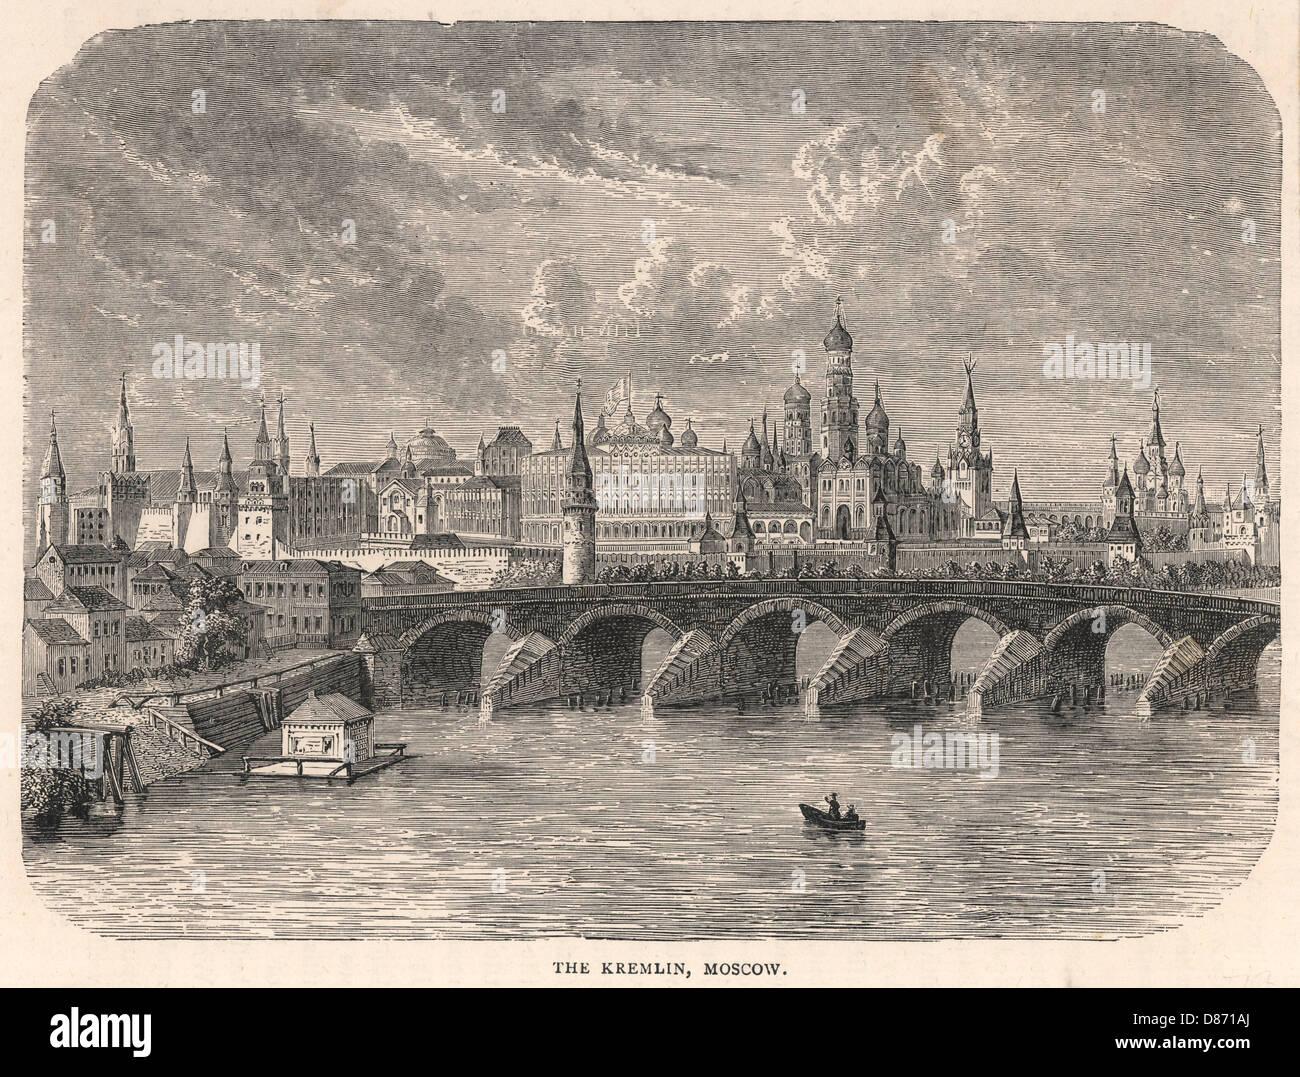 Kremlin 1879 - Stock Image